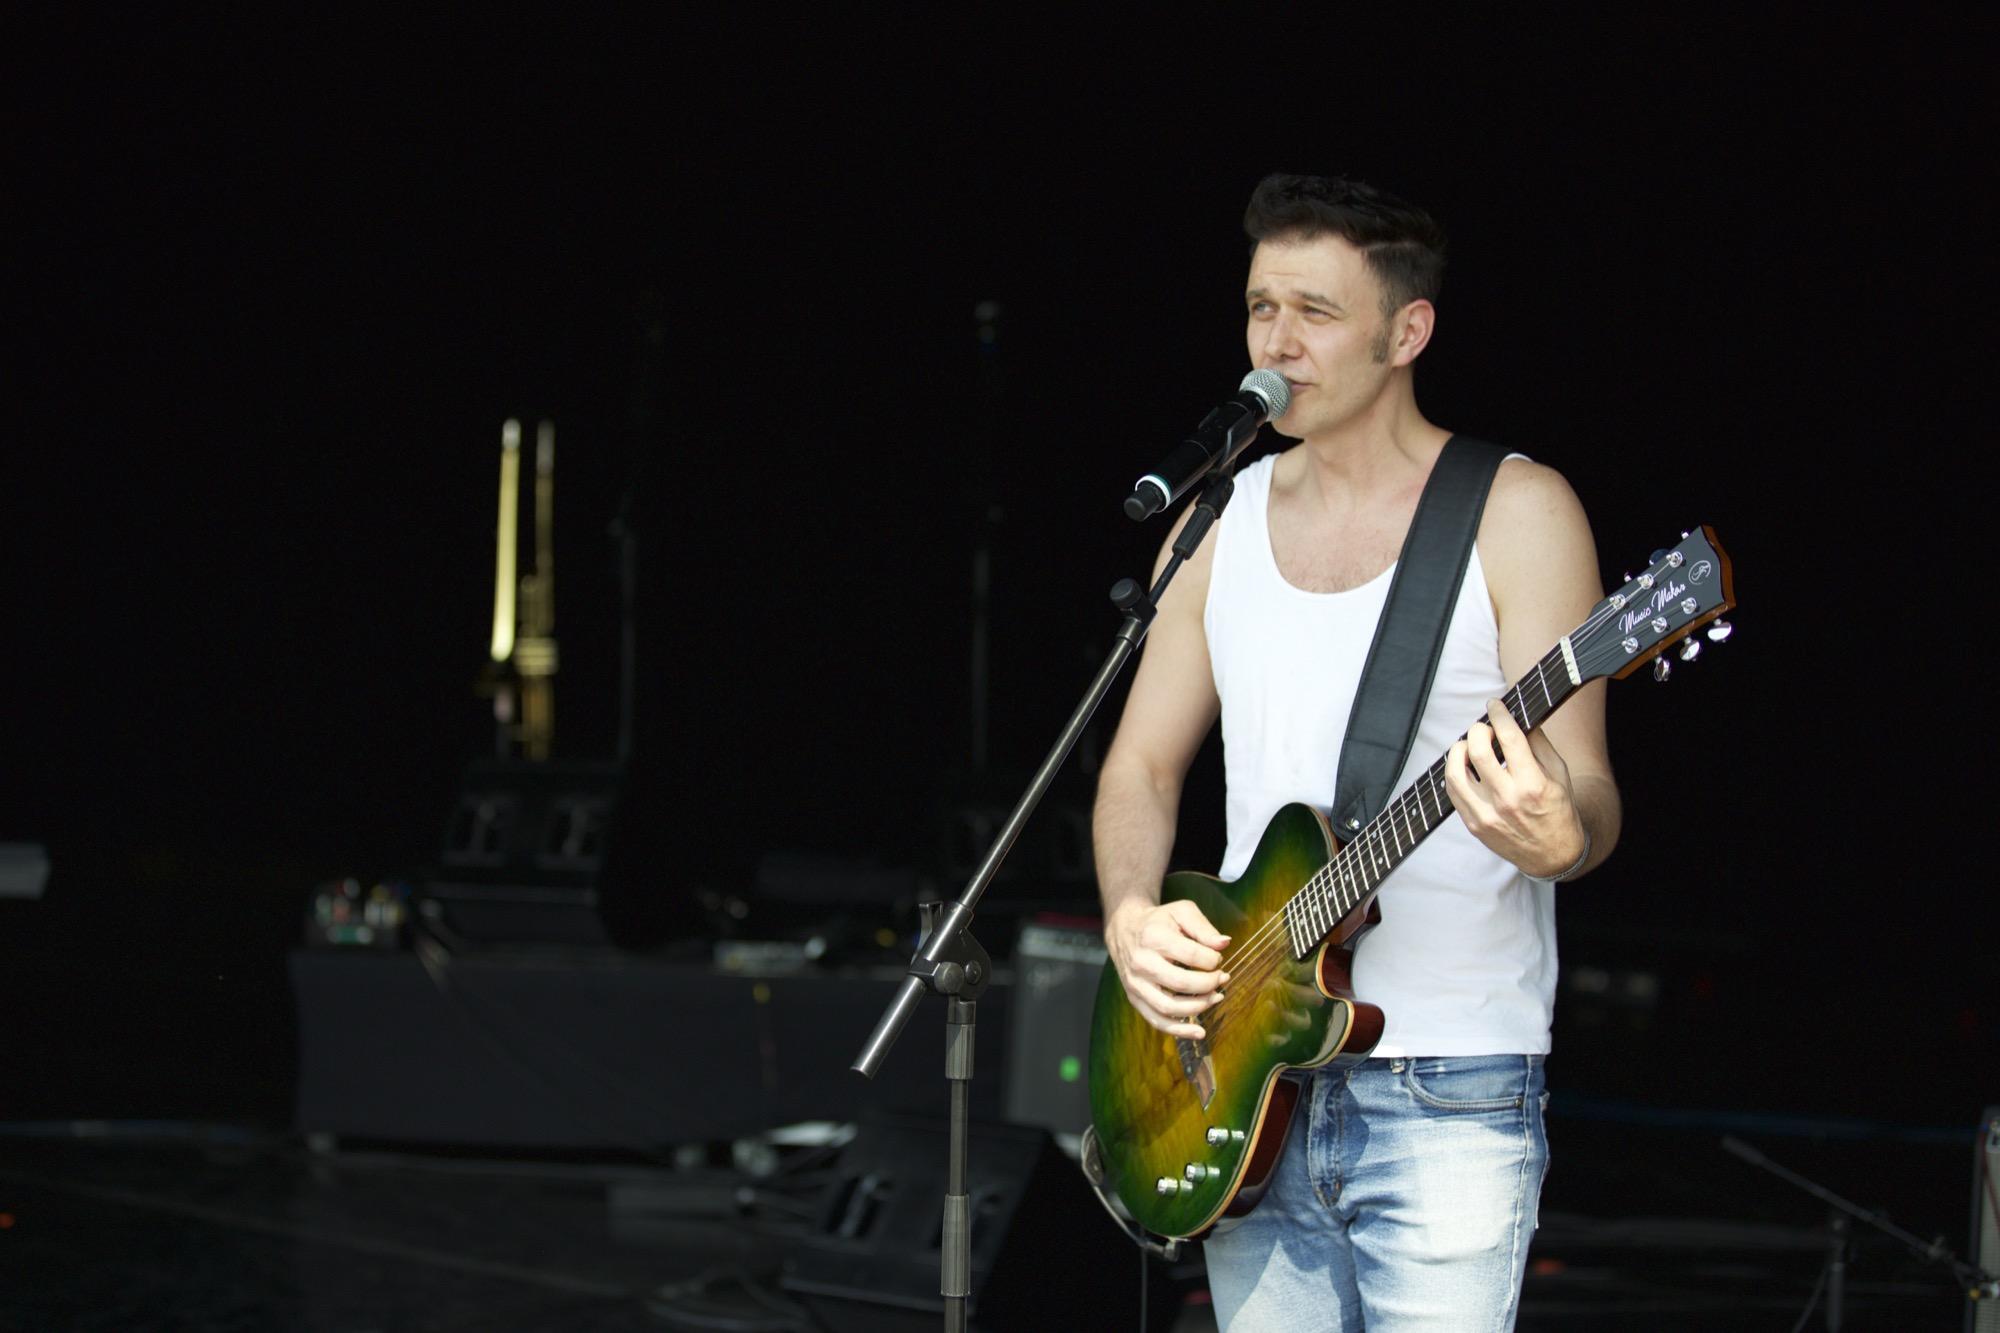 João Suplicy